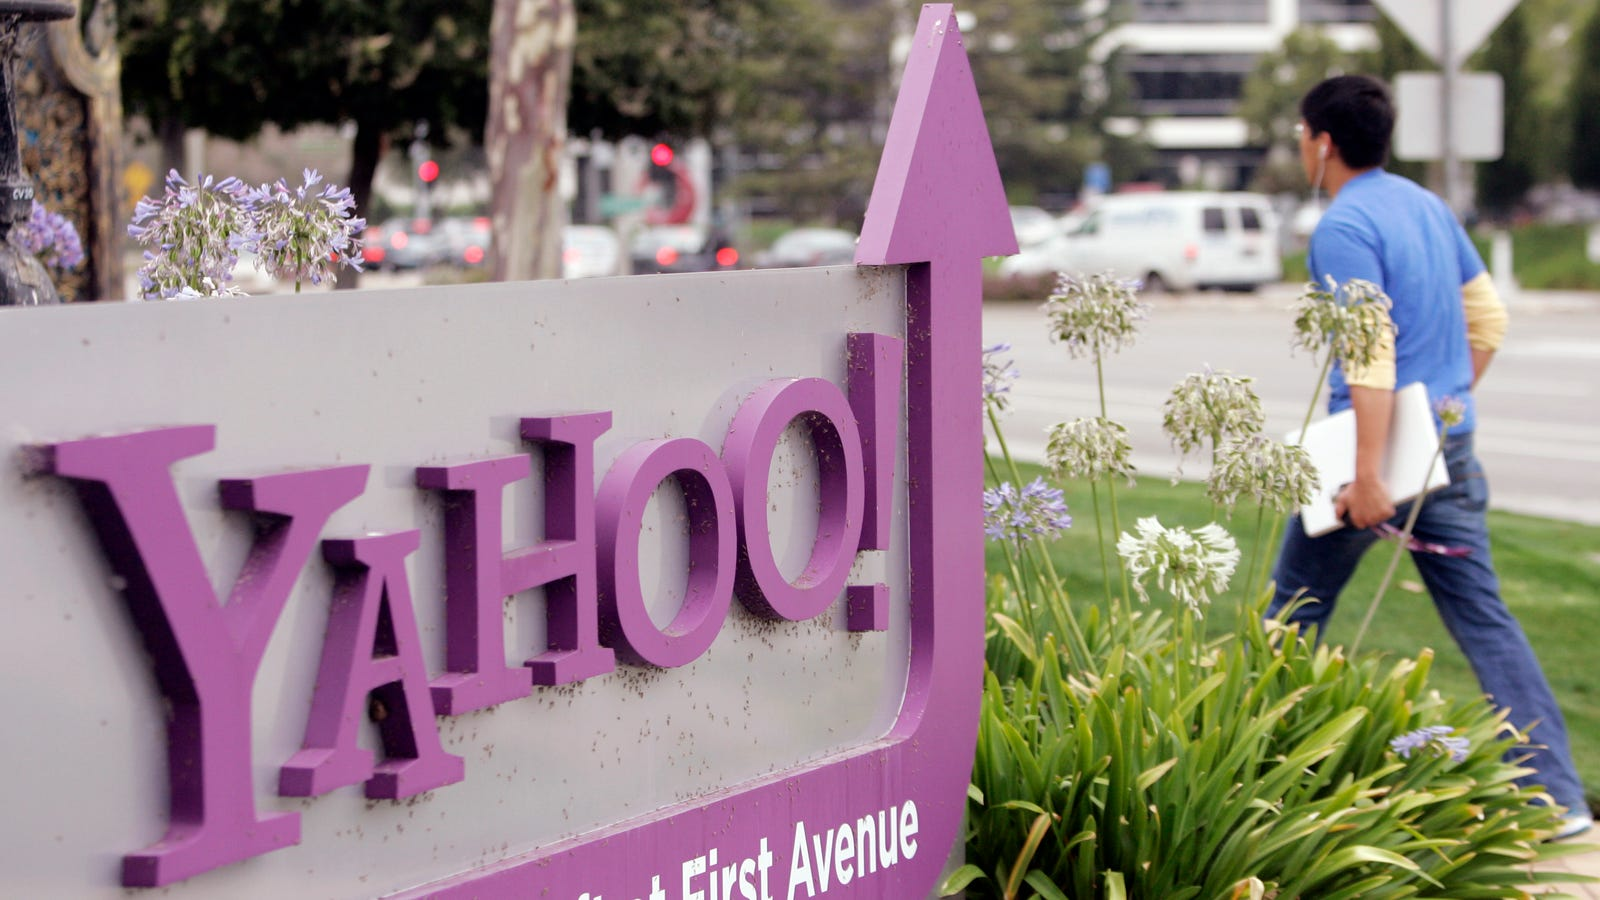 j0aiy3lpegtflfzbcmpa - Court Rejects Tech Bro Gender Discrimination Suit Against Yahoo